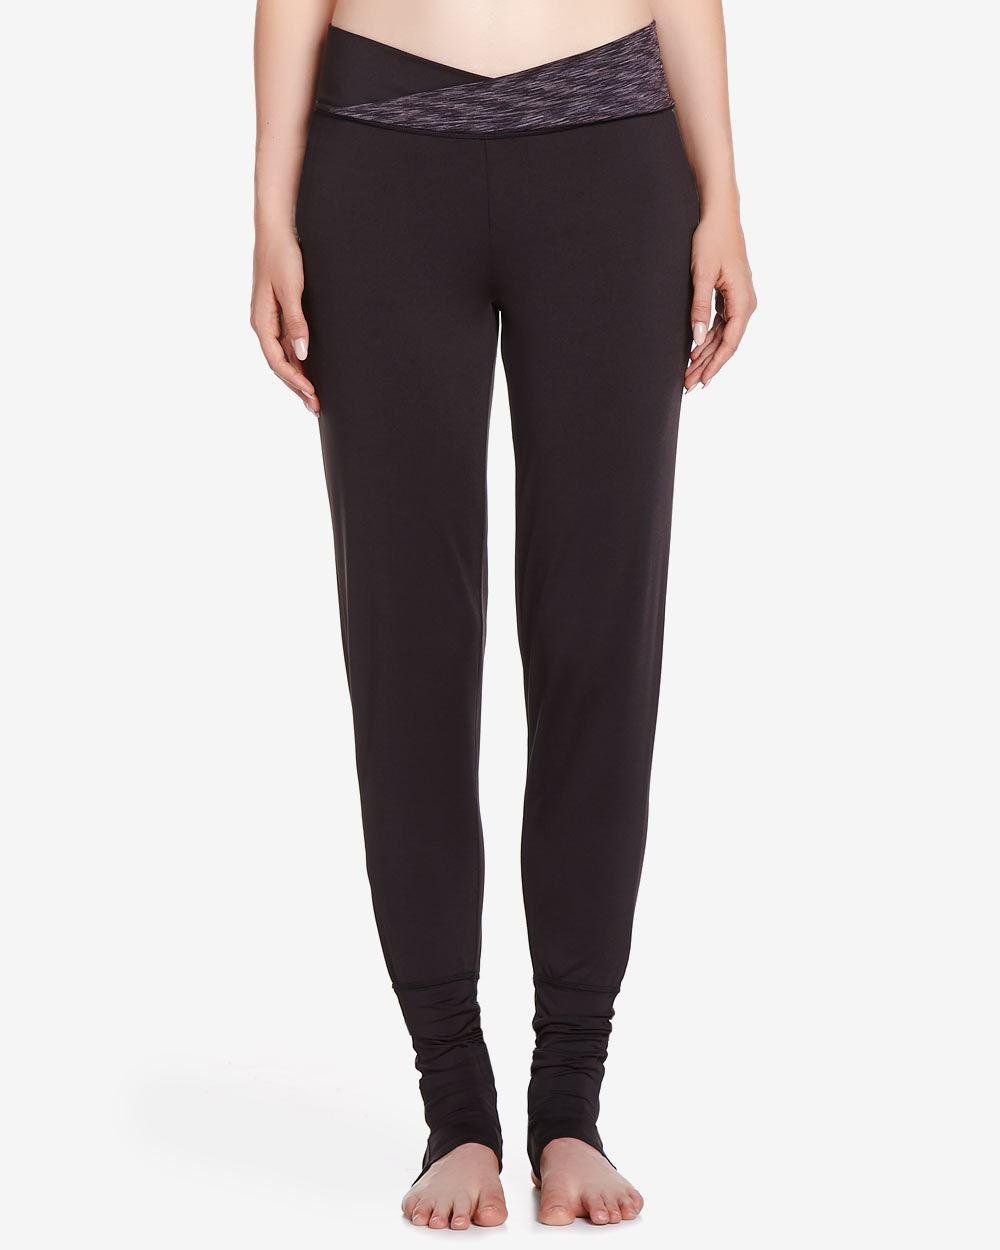 Hyba Loose Fit Yoga Pants | Women | Reitmans